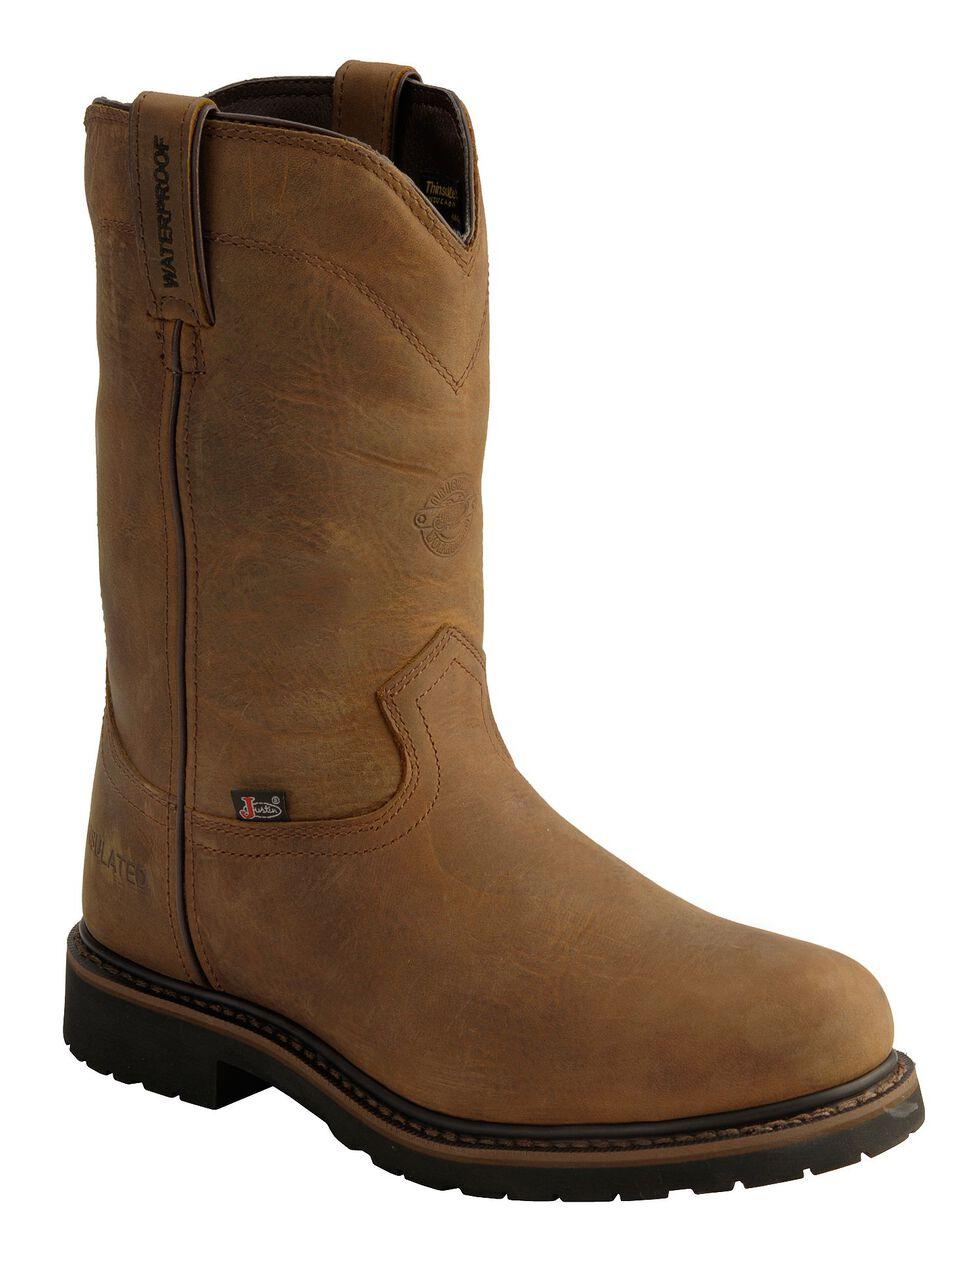 Justin Men's Drywall Insulated Waterproof Work Boots - Steel Toe, Brown, hi-res